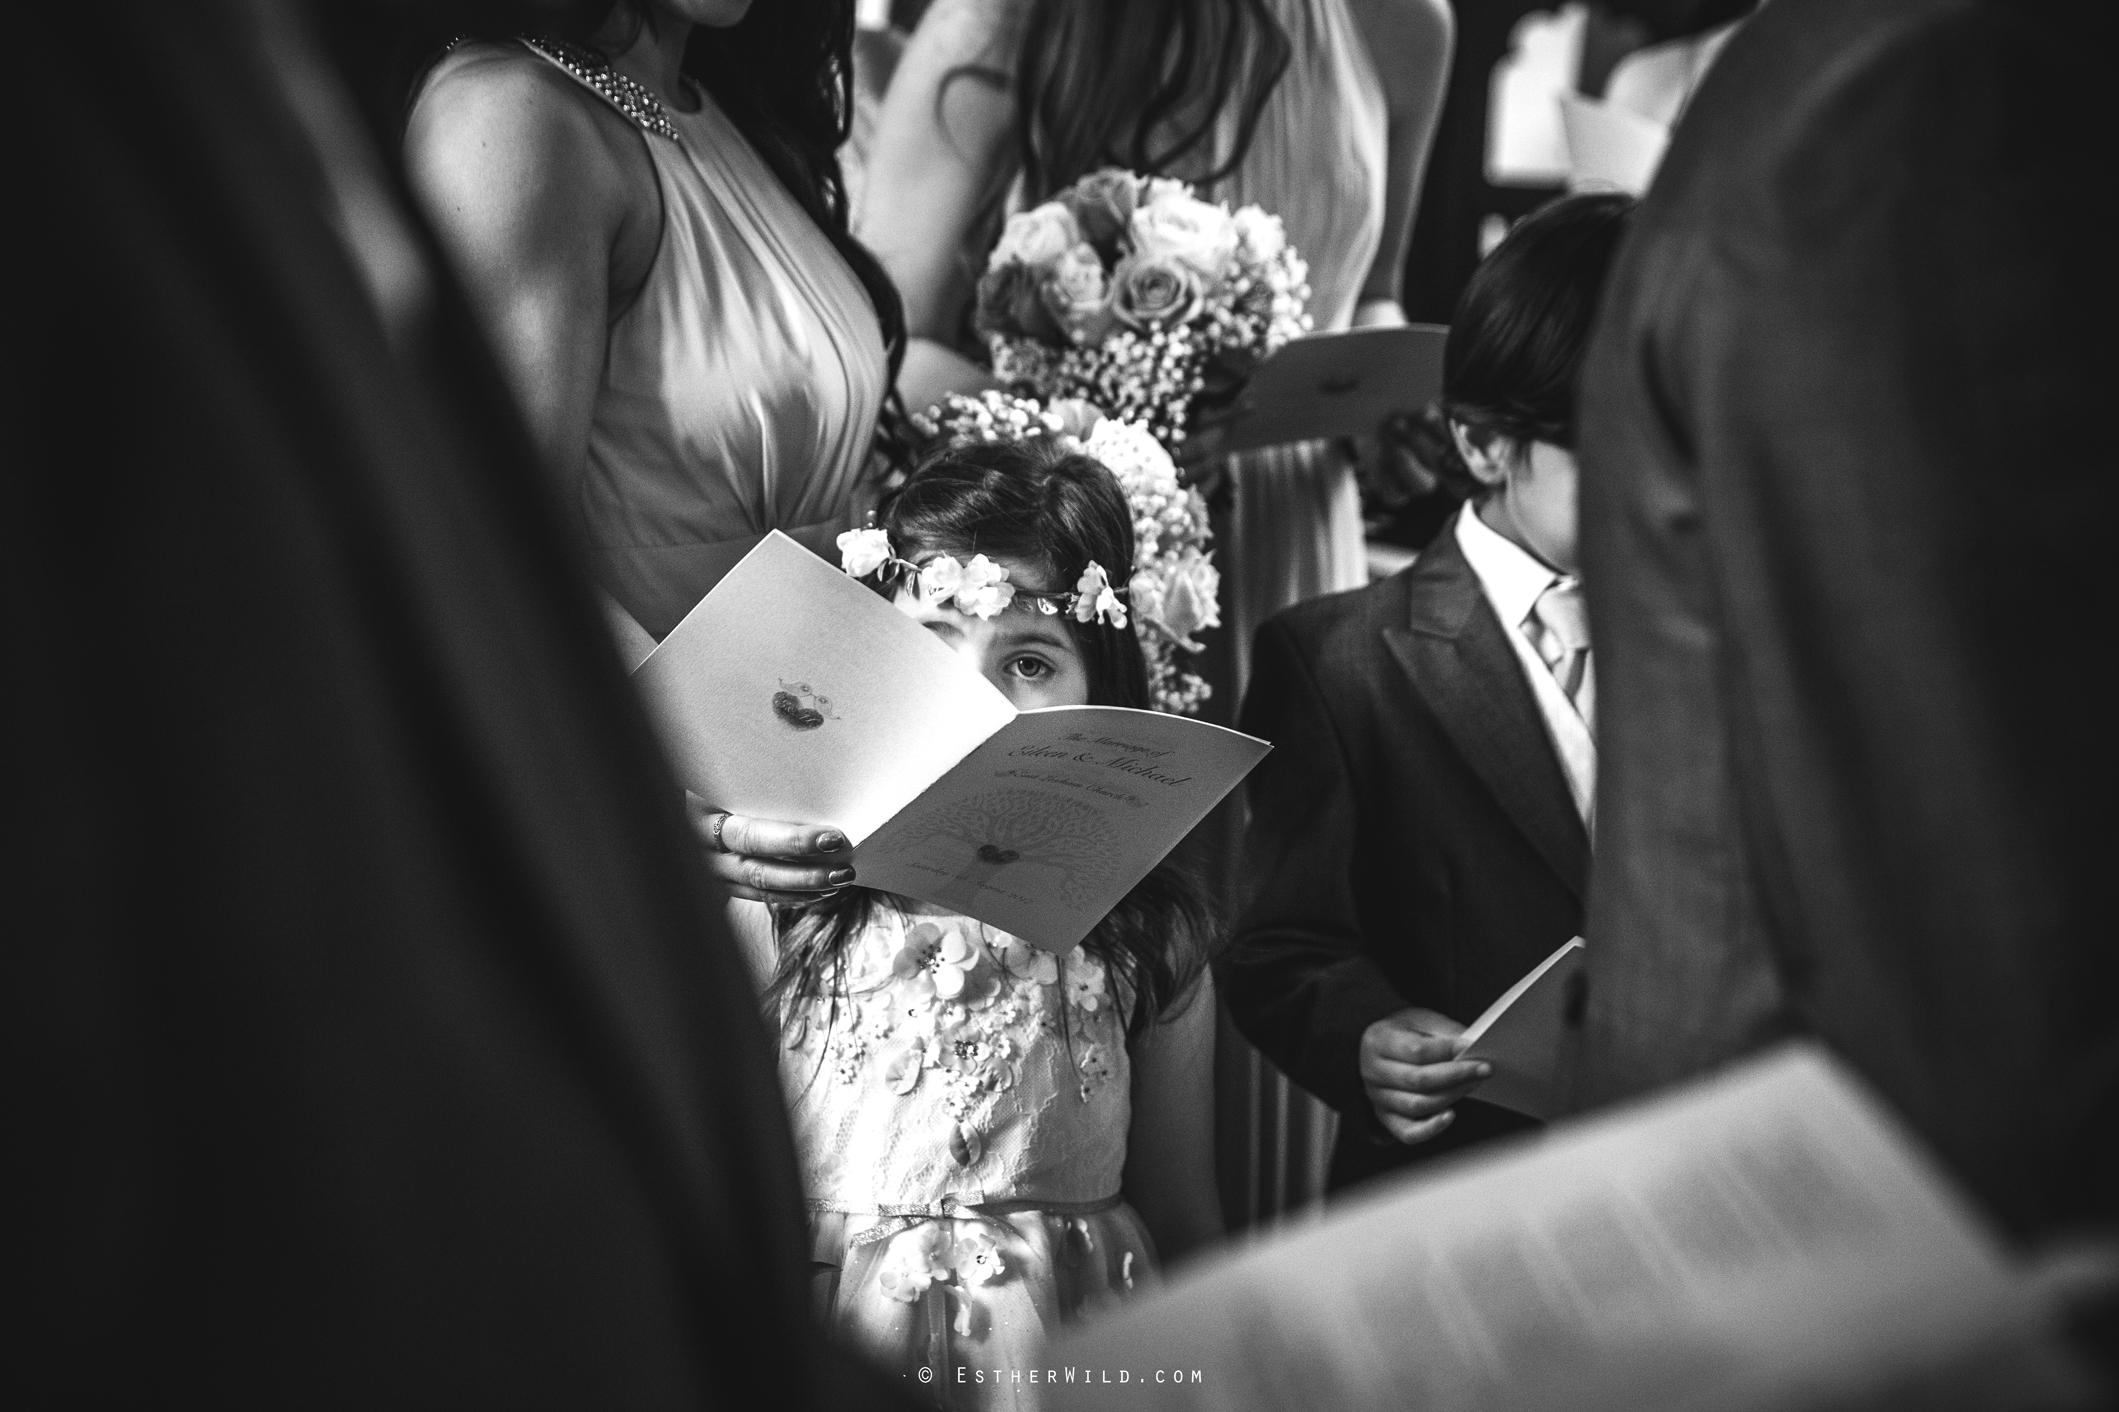 0817_Rathskellar_Kings_Lynn_East_Lexham_Church_Wedding_Photographer_Esther_Wild_IMG_0424-1.jpg